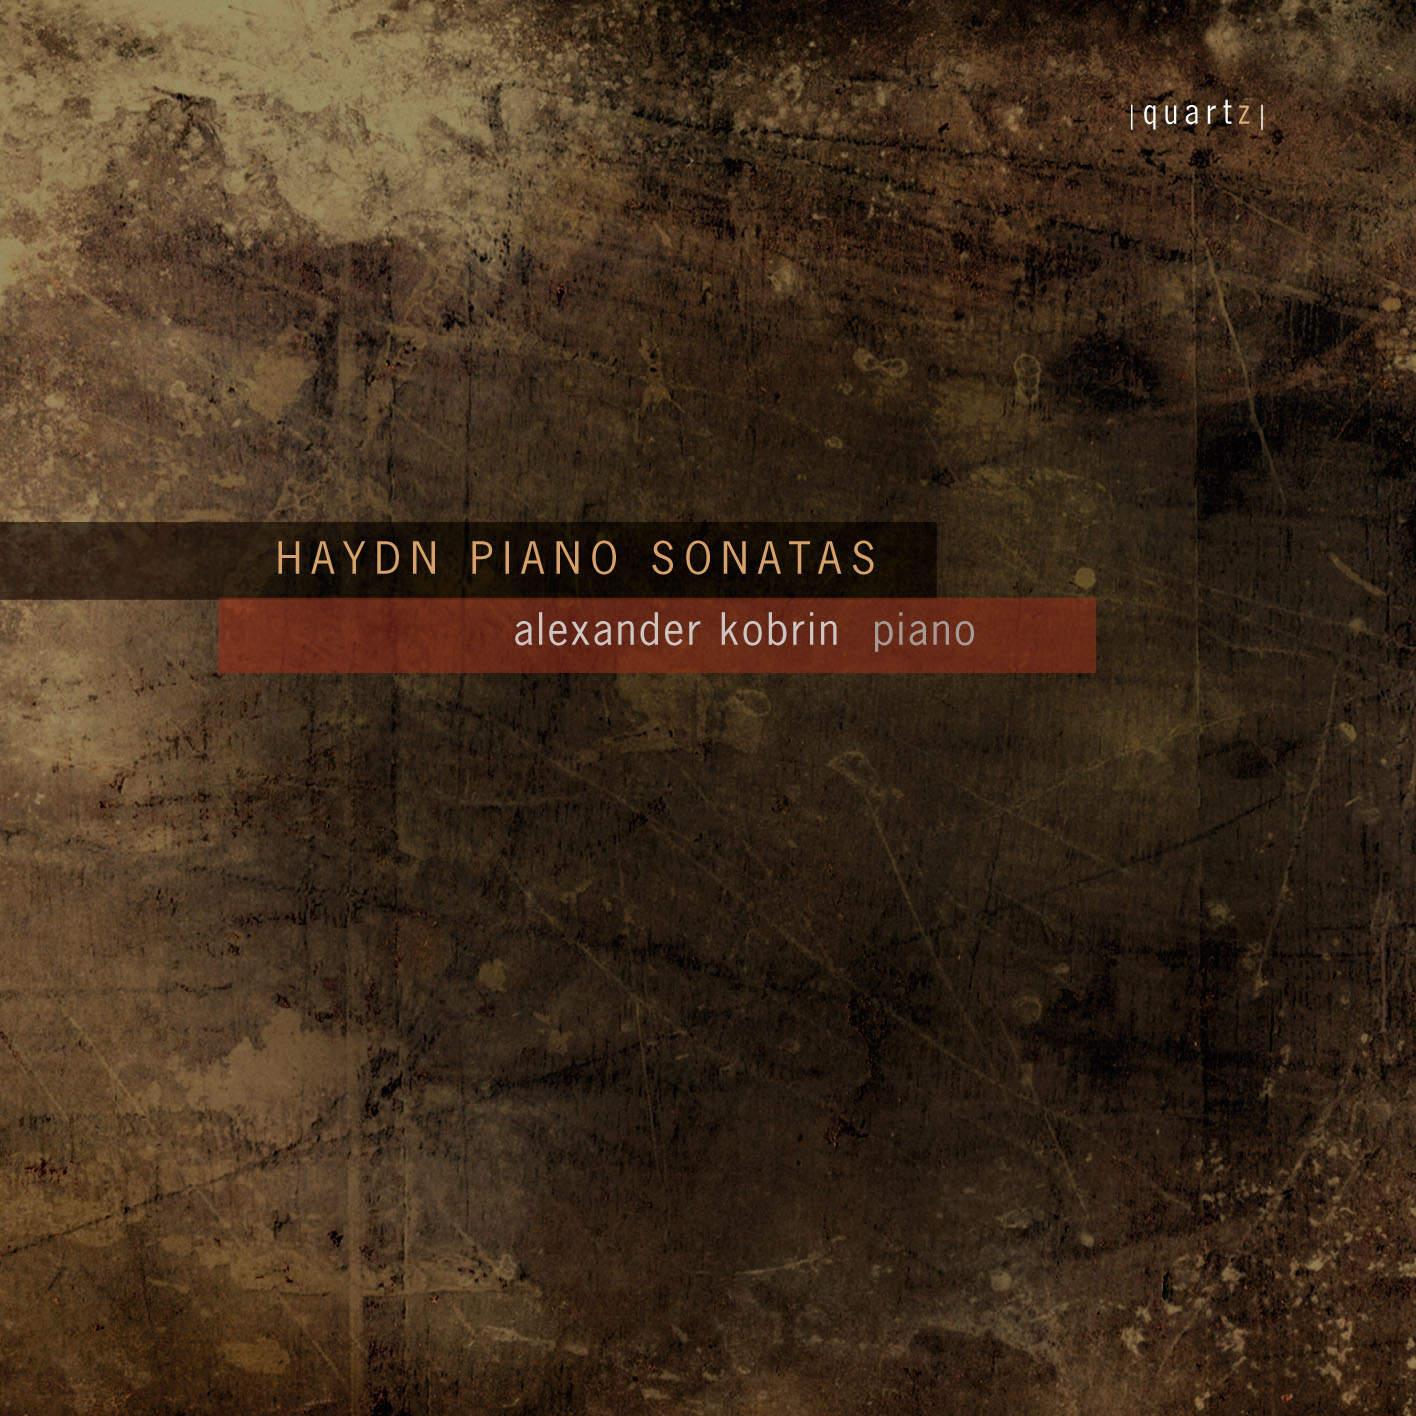 Alexander Kobrin (piano)